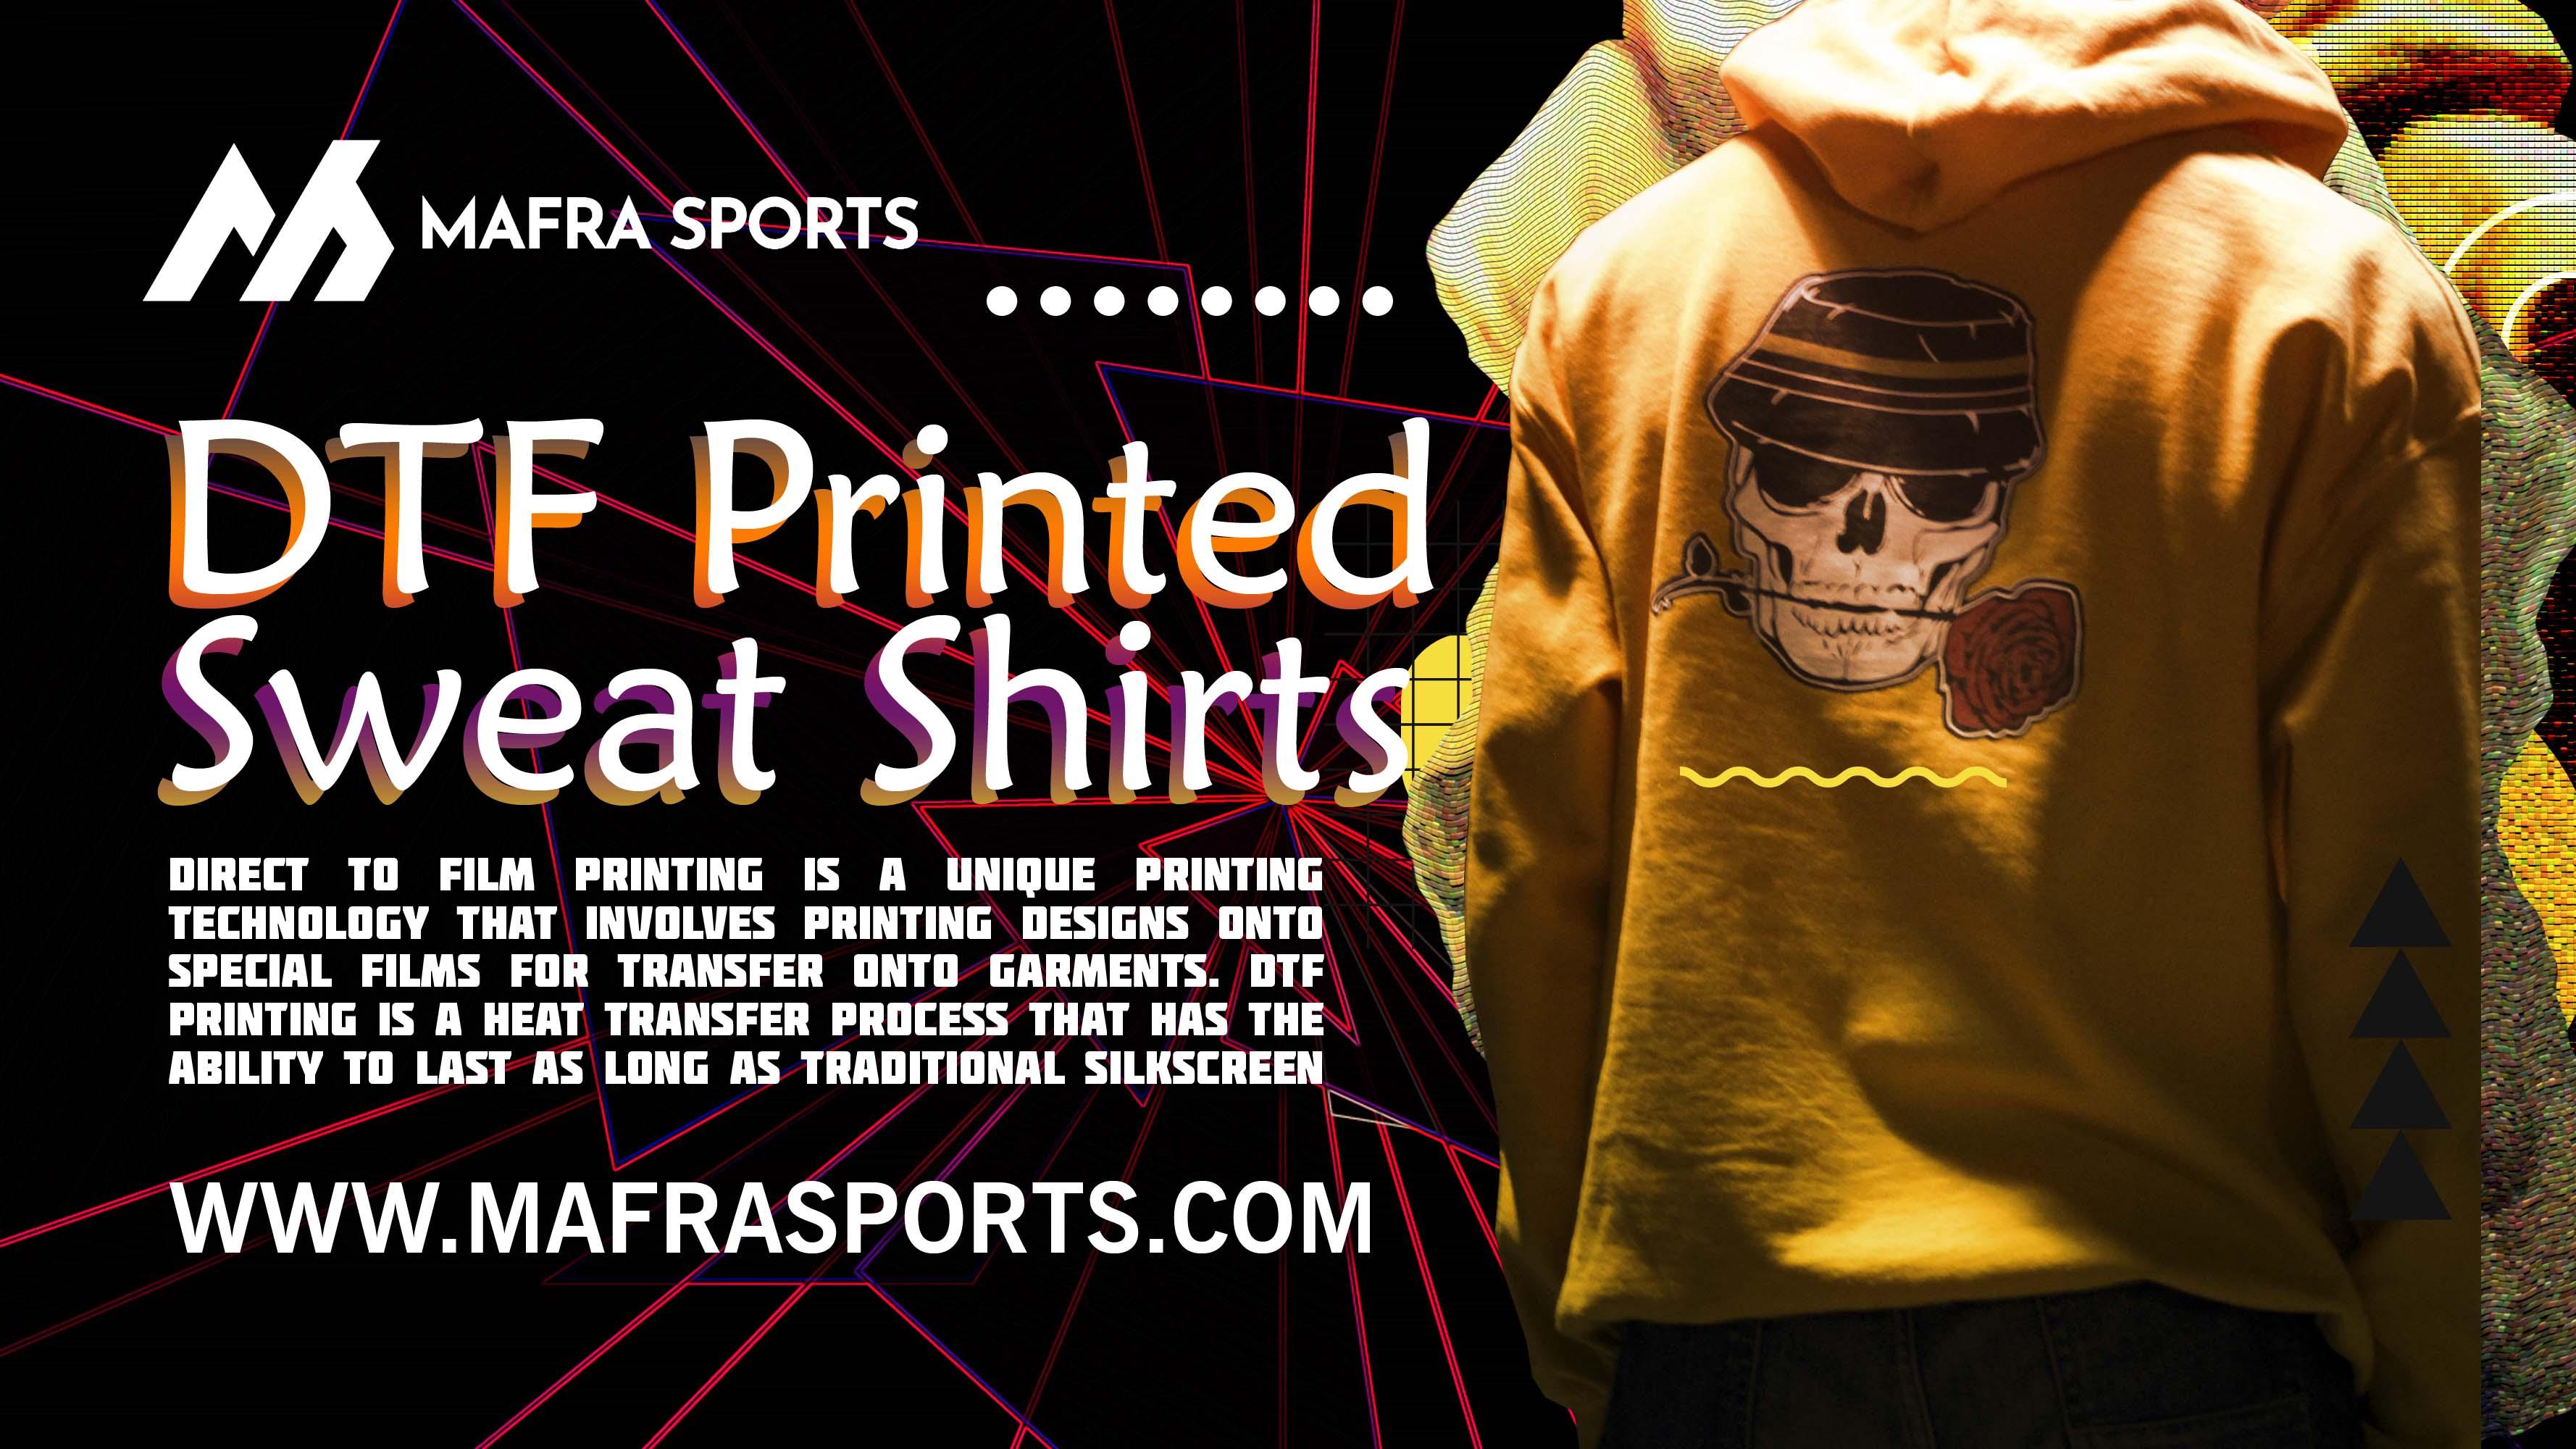 dtf printed sweatshirts